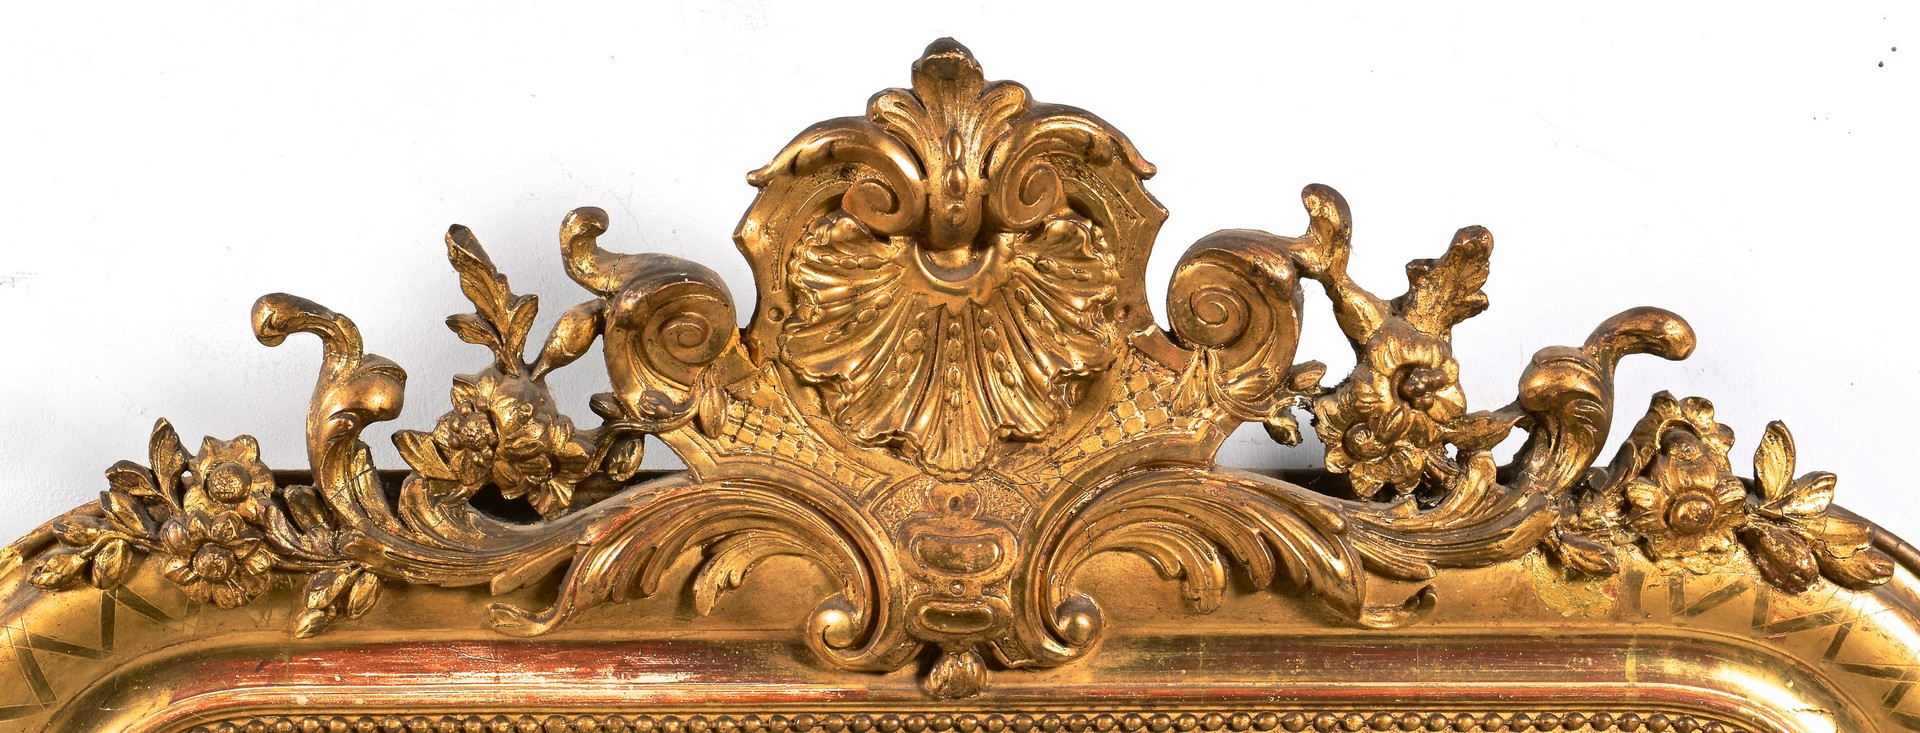 Lot 307 continental rococo style gilt mirror for Baroque fashion trend